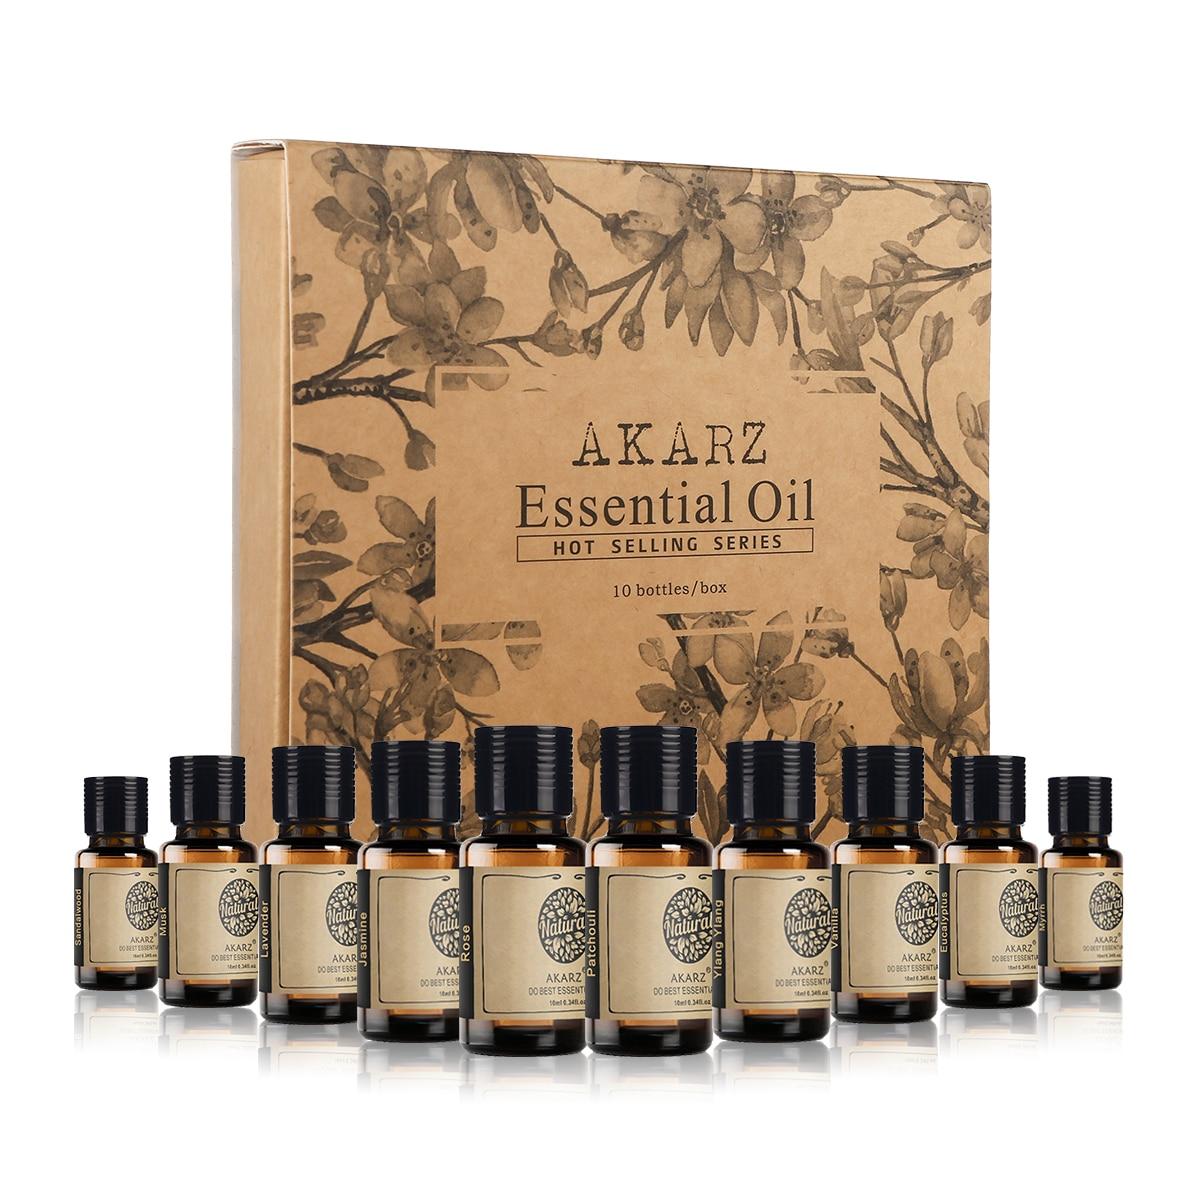 AKARZ Hots 10 Sets Sandalwood,Musk,Lavender,Jasmine,Rose,Patchouli,Ylang Ylang,Vanilla,Eucalyptus,Myrrh Essential Oil Diffuser